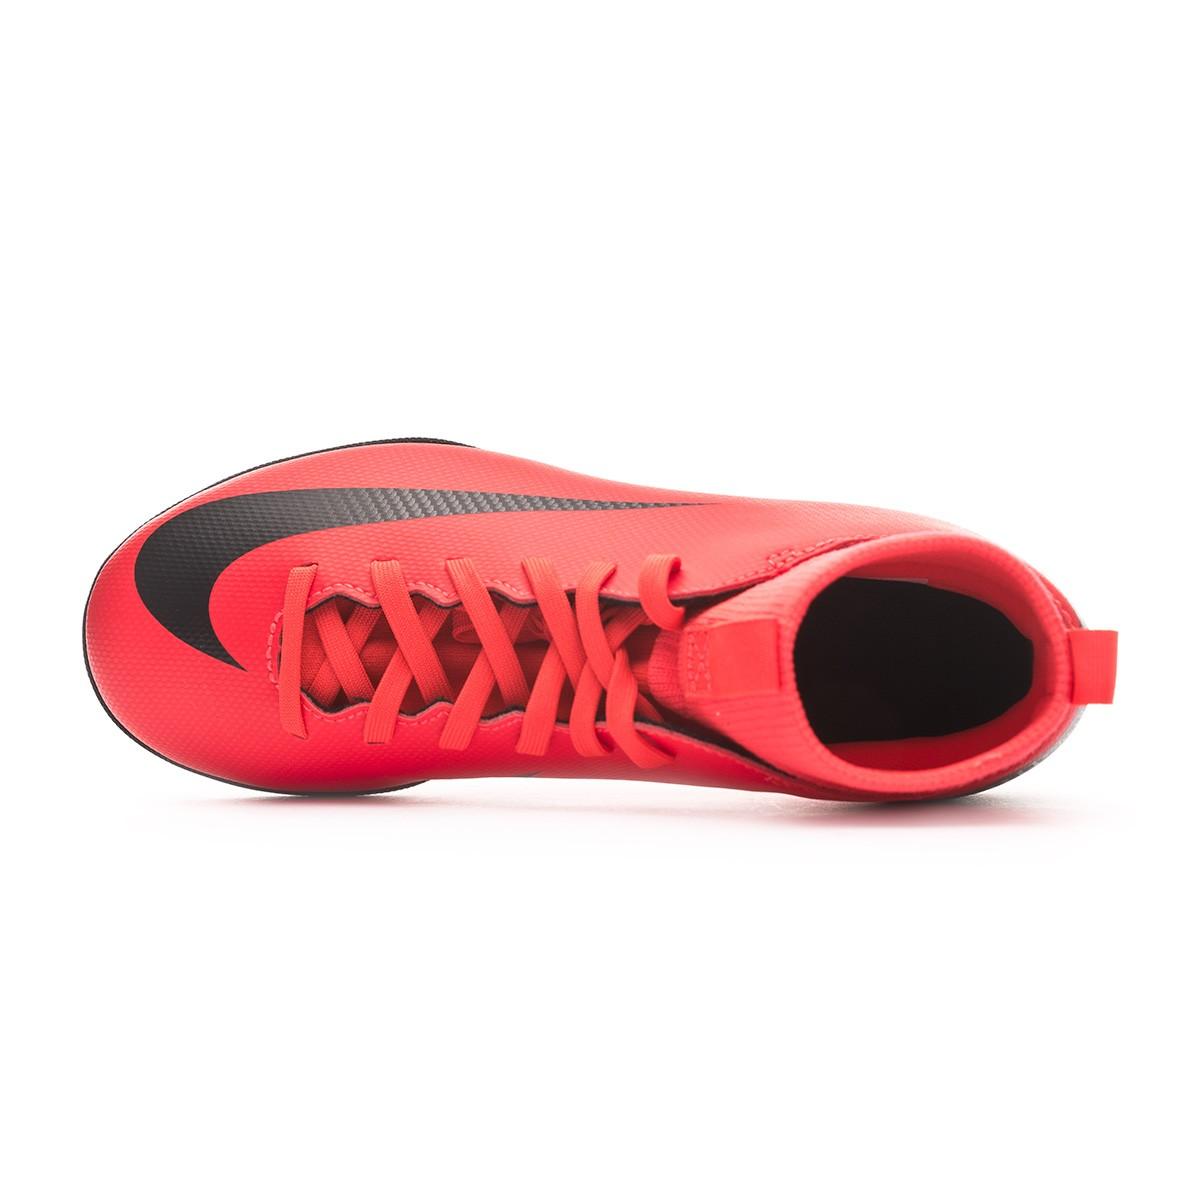 Sapatilhas Nike Mercurial SuperflyX VI Club CR7 Turf Crianças